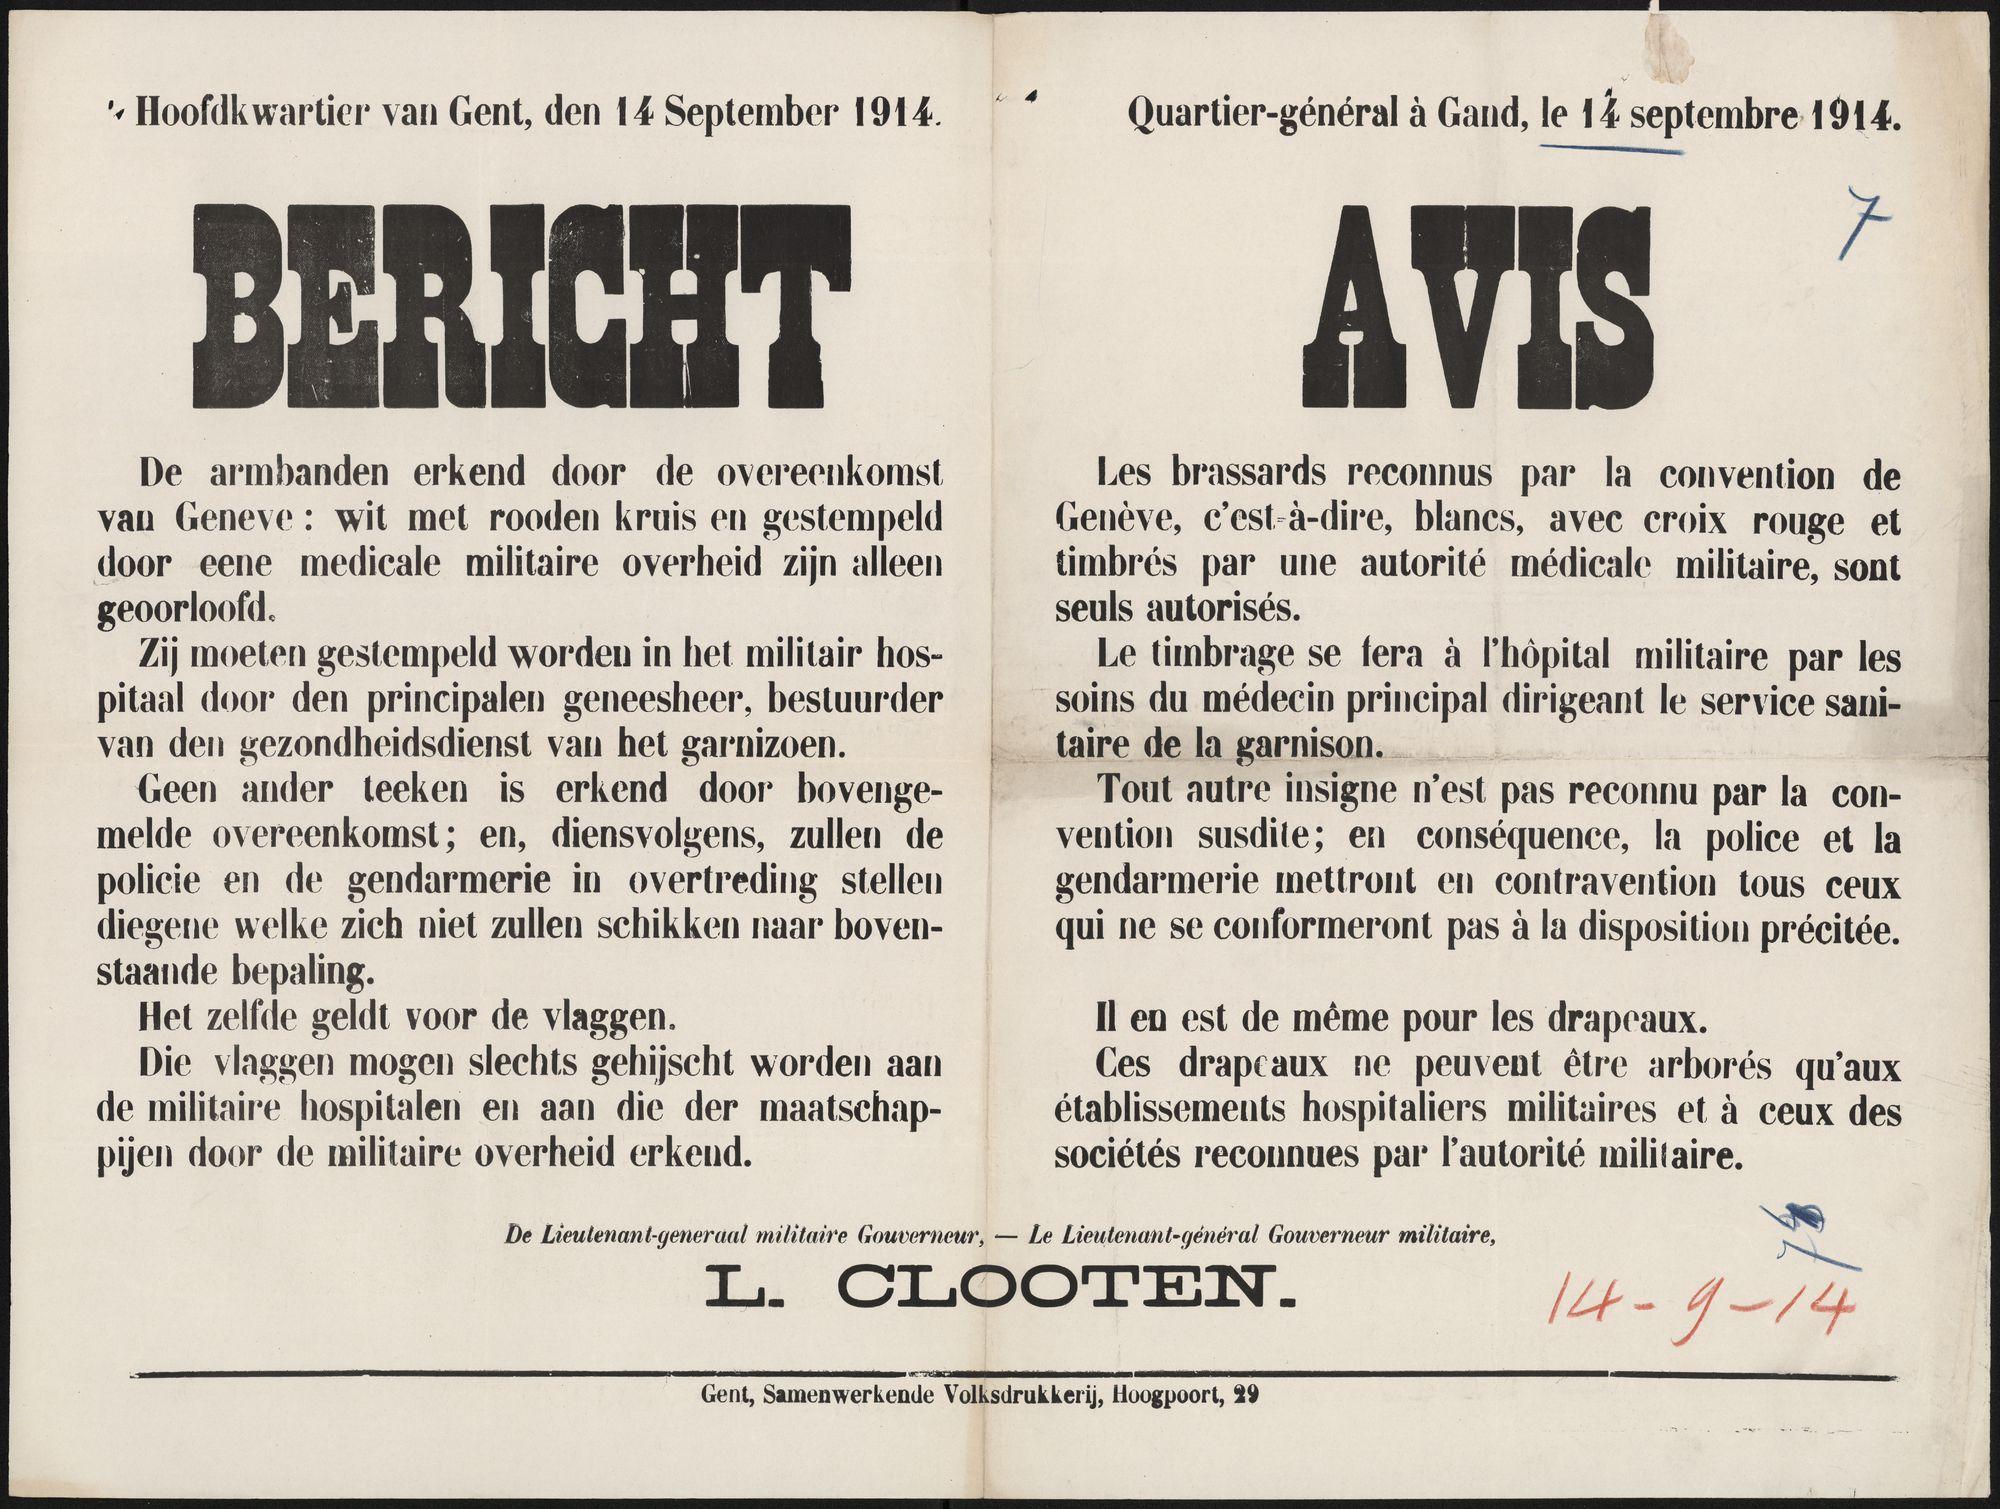 Bericht | Avis.